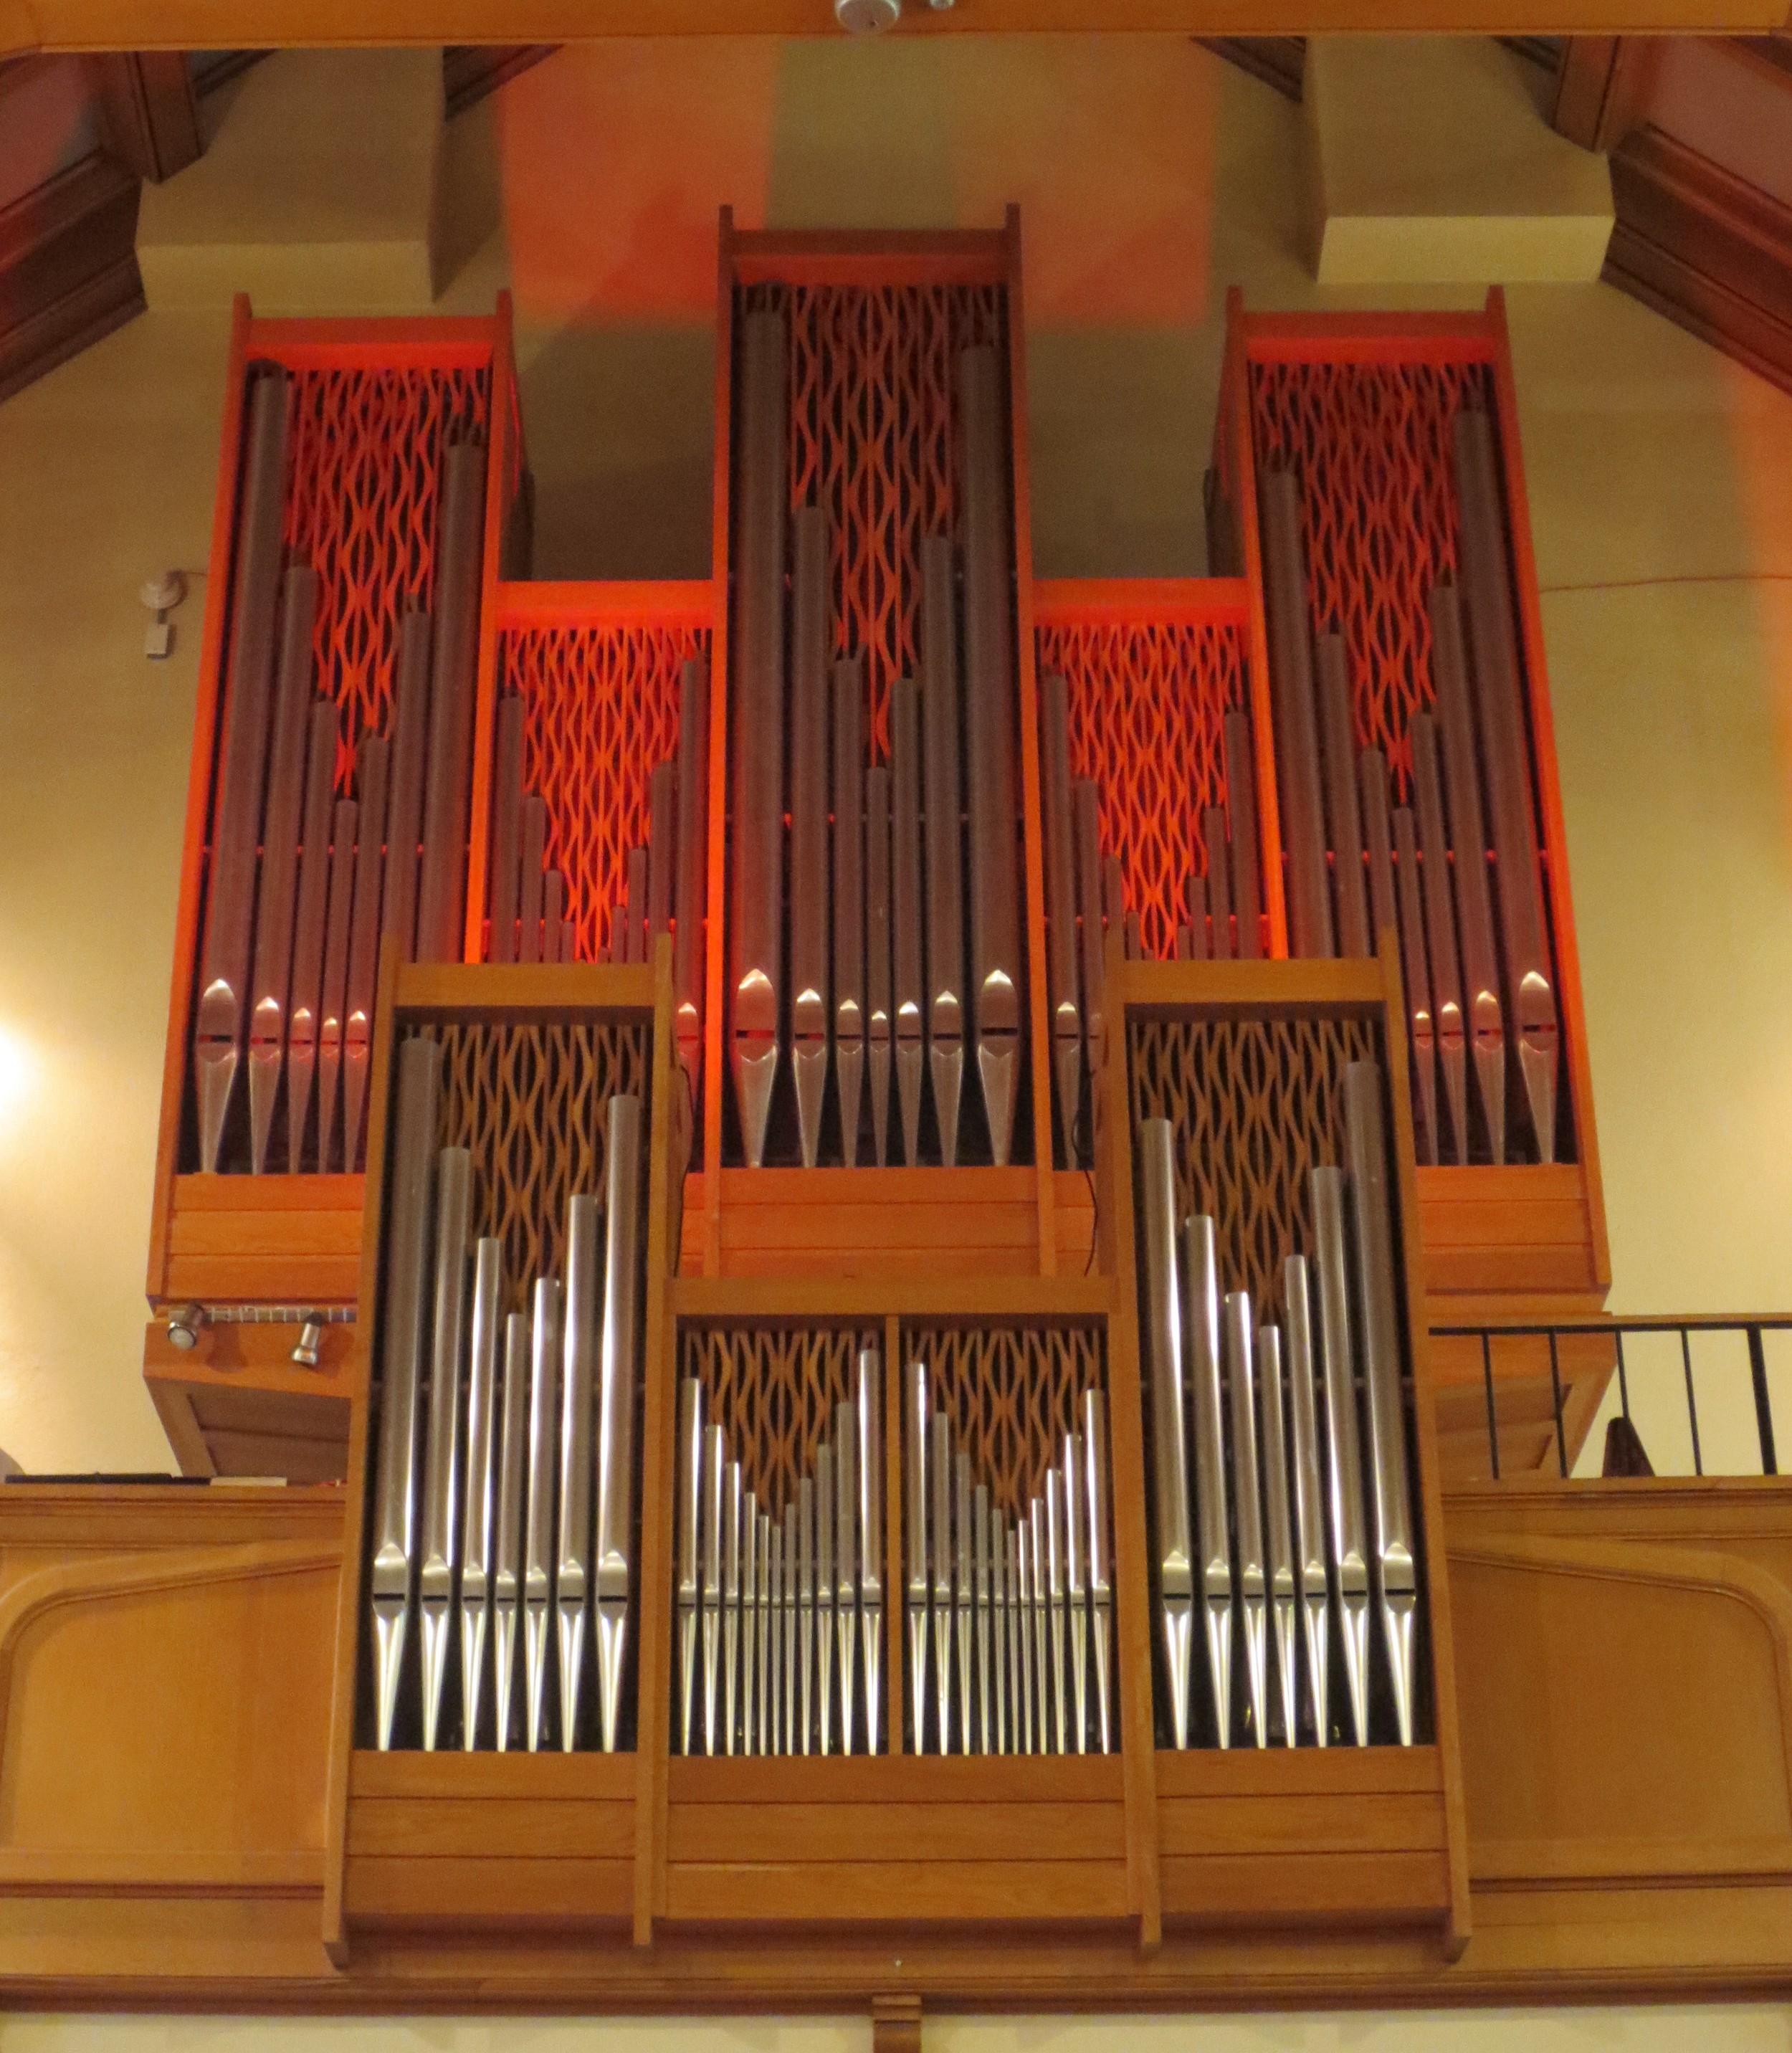 Wolff Opus VIII Organ